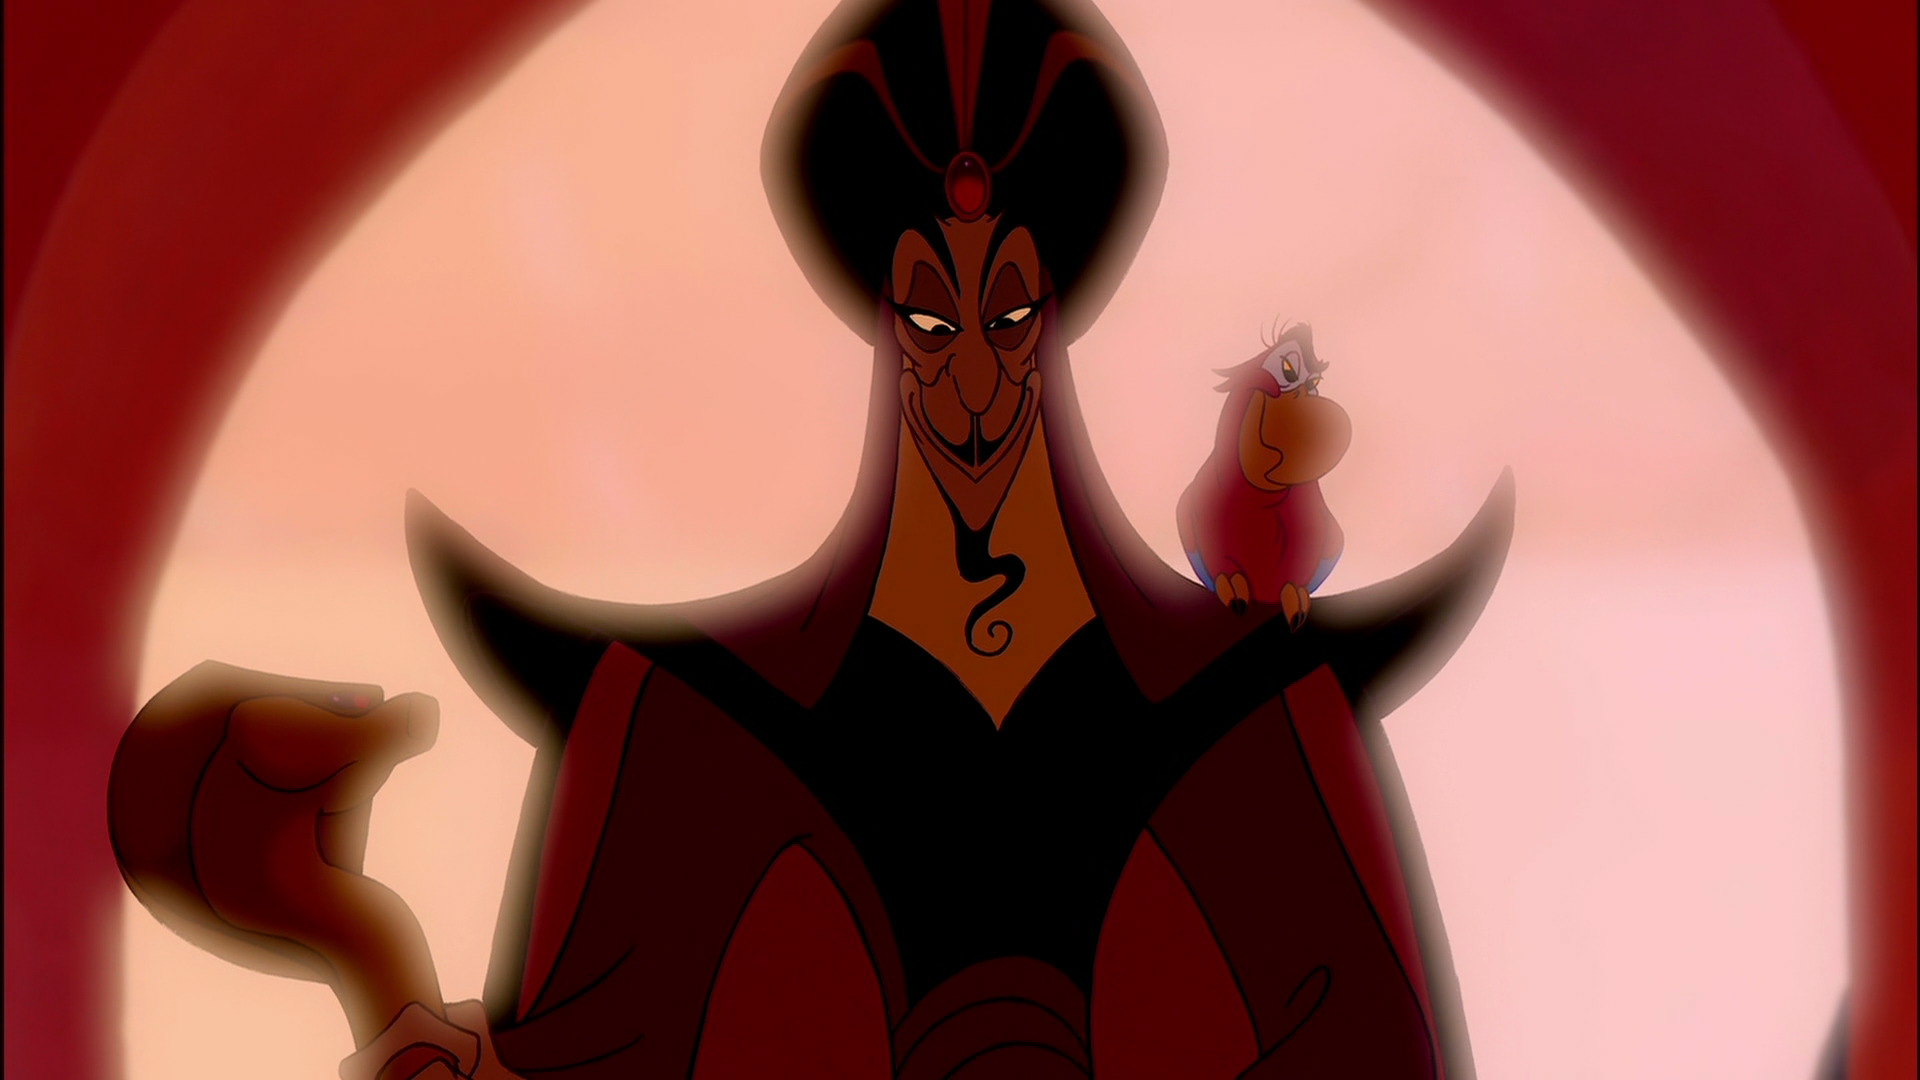 Aladdin disney soundtrack latino dating